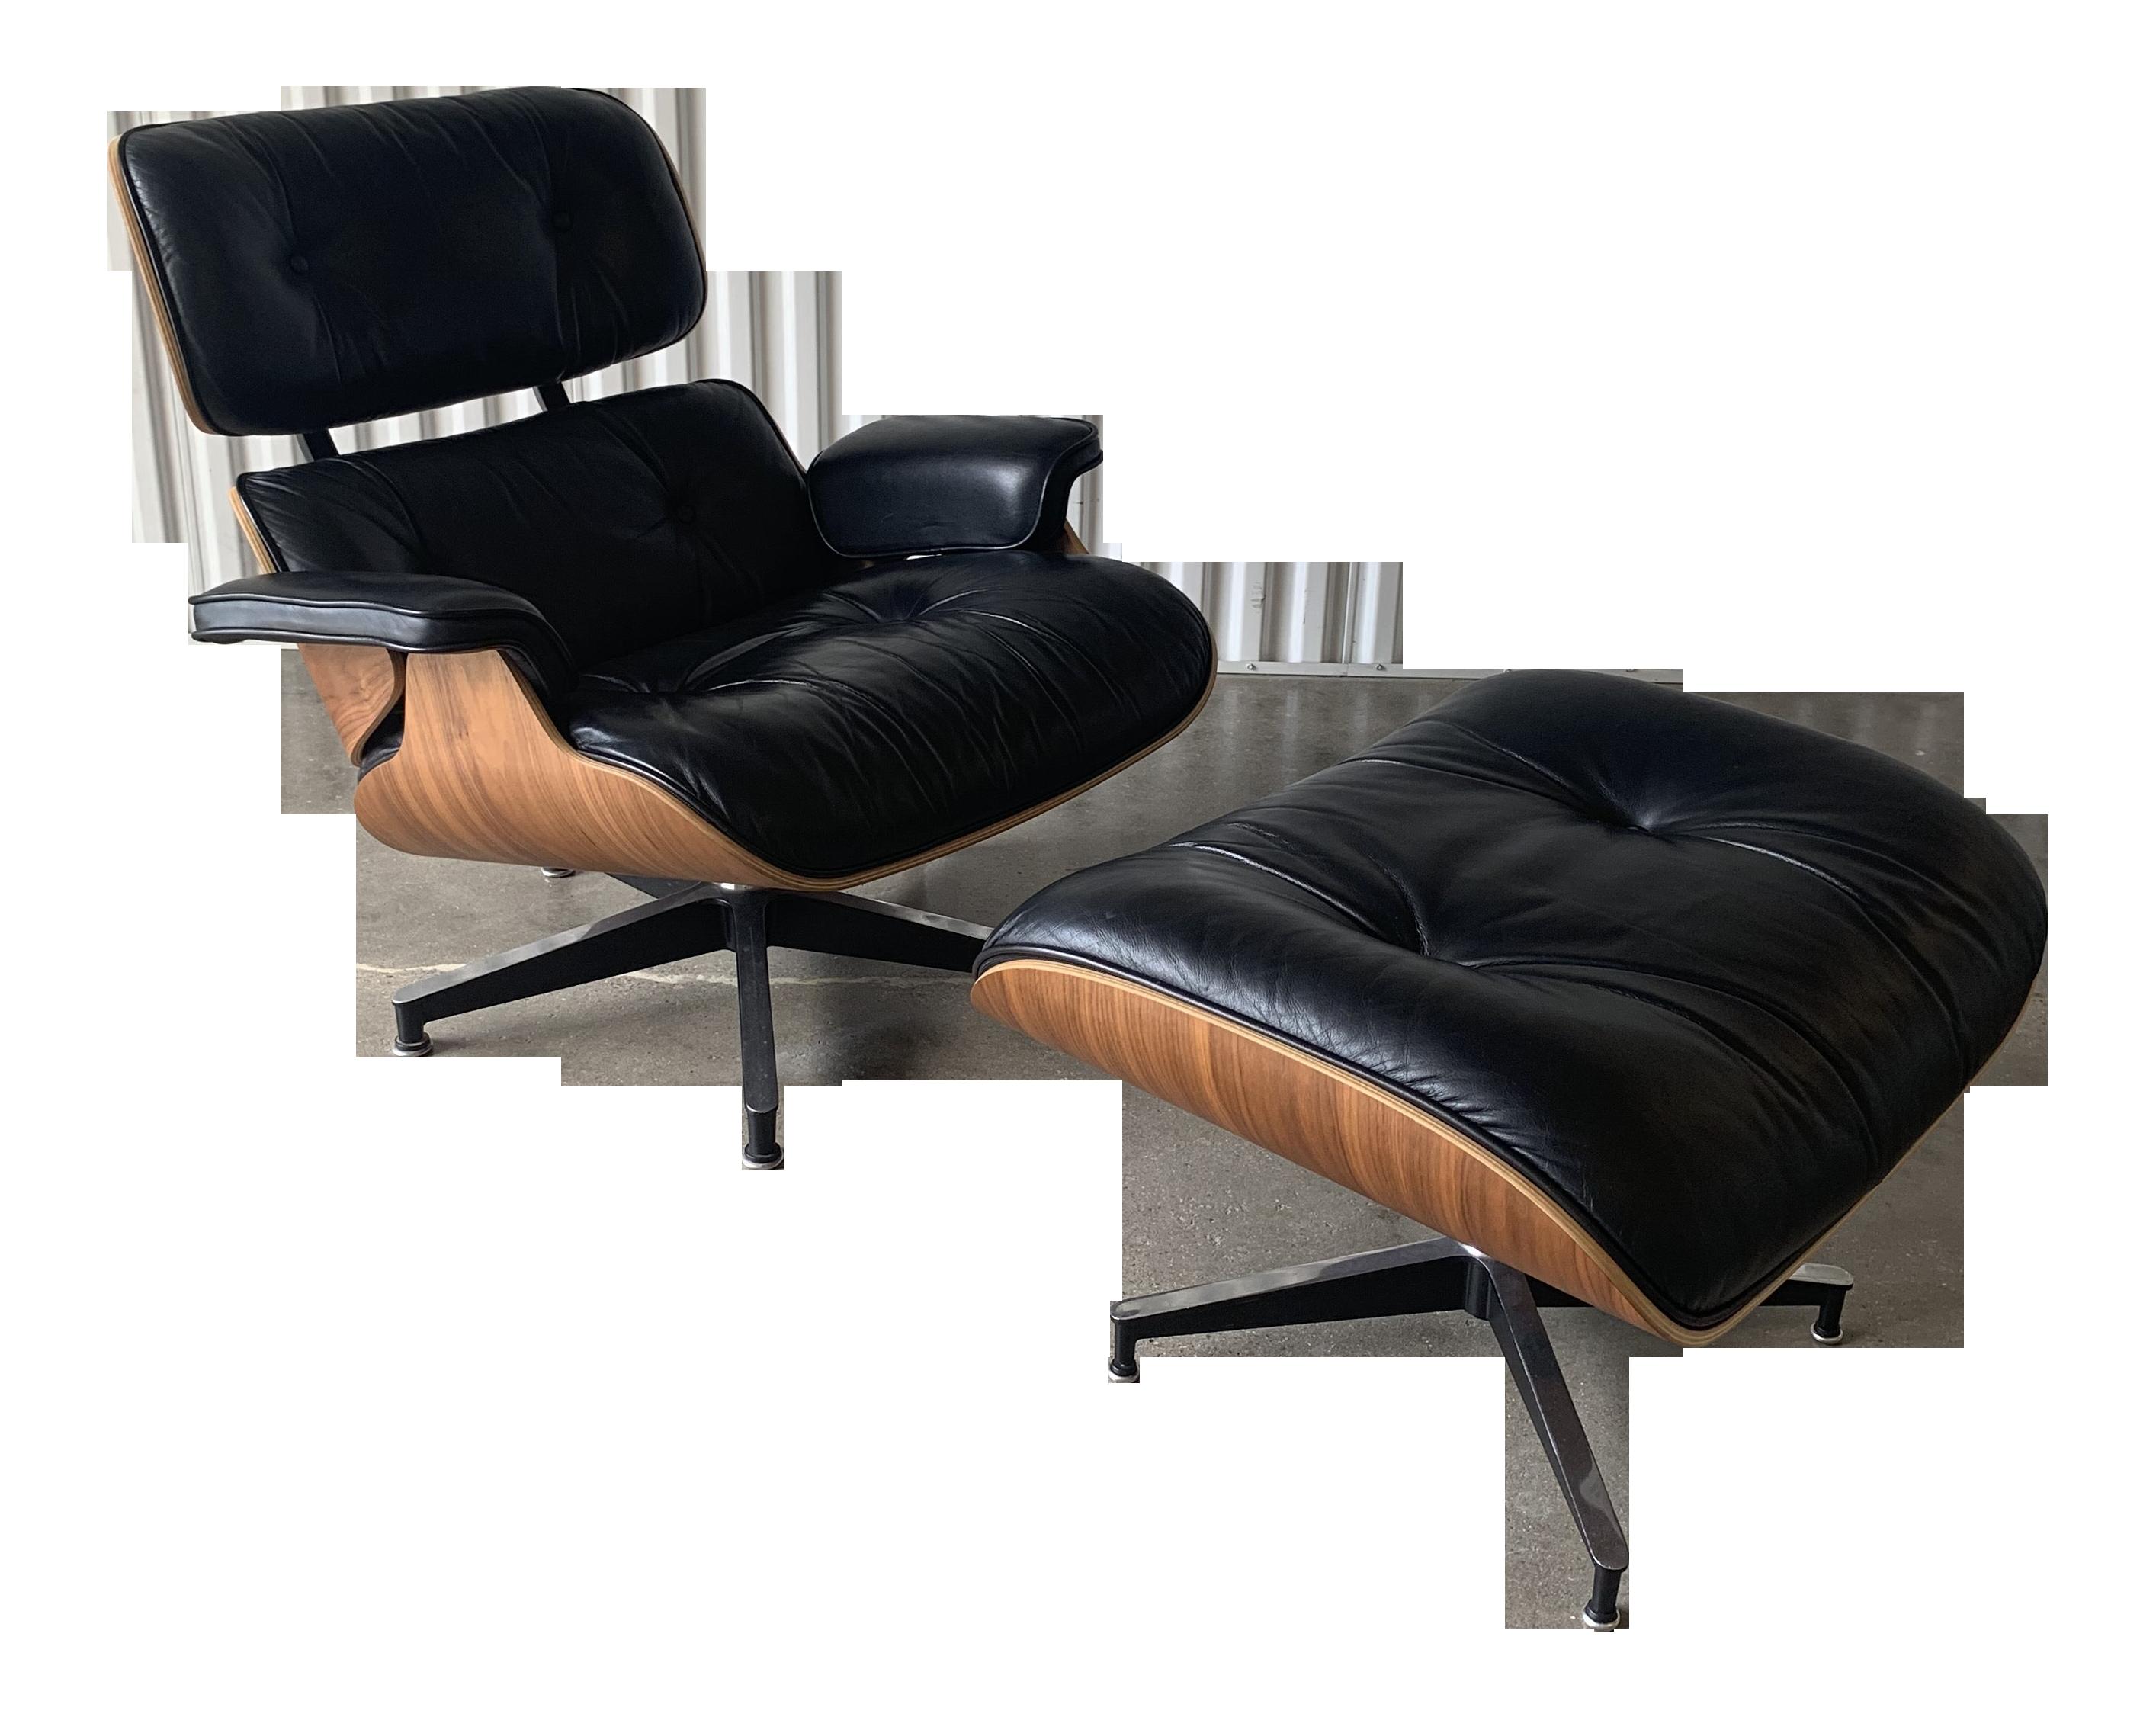 Superb Herman Miller Eames Lounge Chair Ottoman Uwap Interior Chair Design Uwaporg